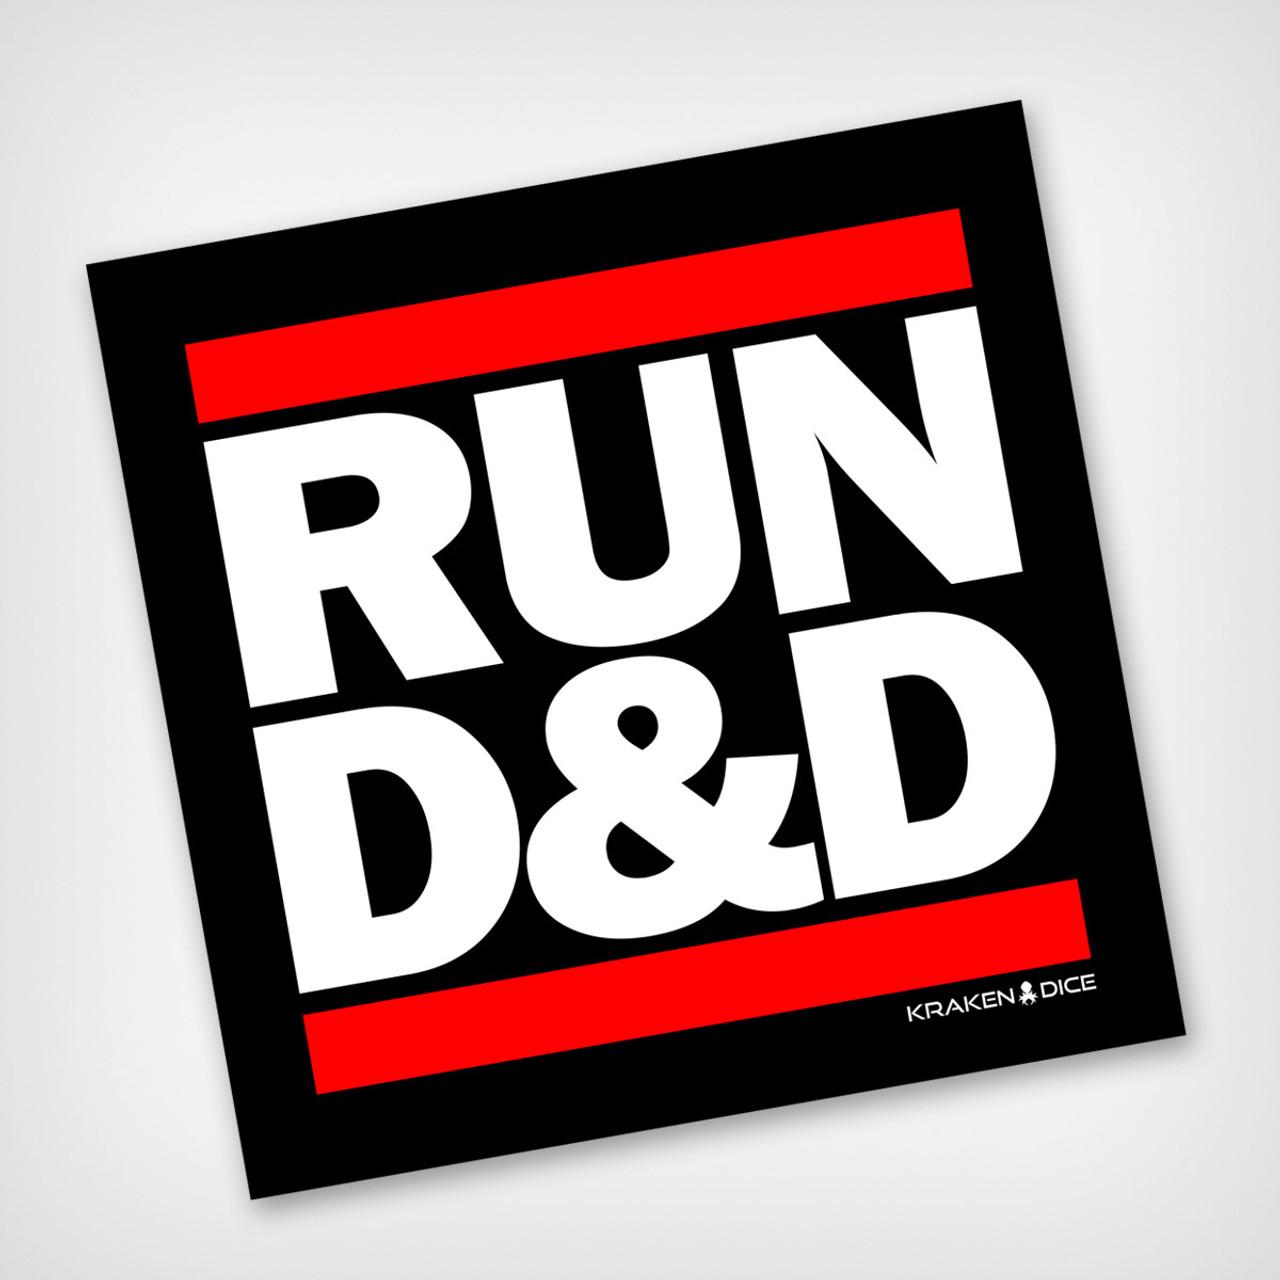 Run dd kraken branded sticker